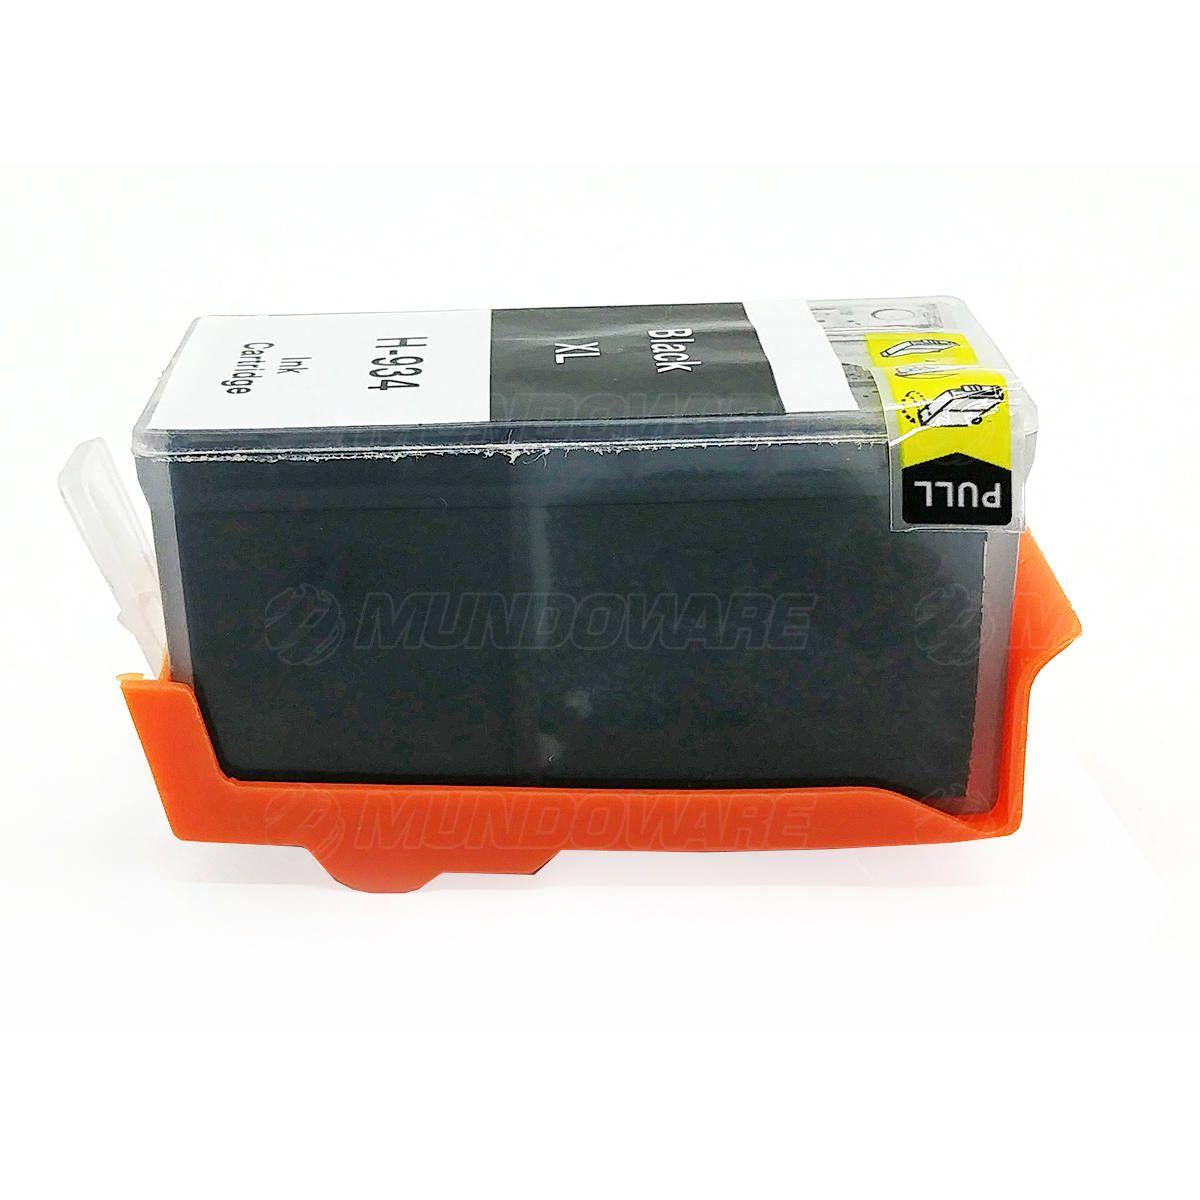 Compatível: Cartucho de Tinta 934xl 934 xl para Impressora HP Pro 6230 6830 / Preto / 53ml